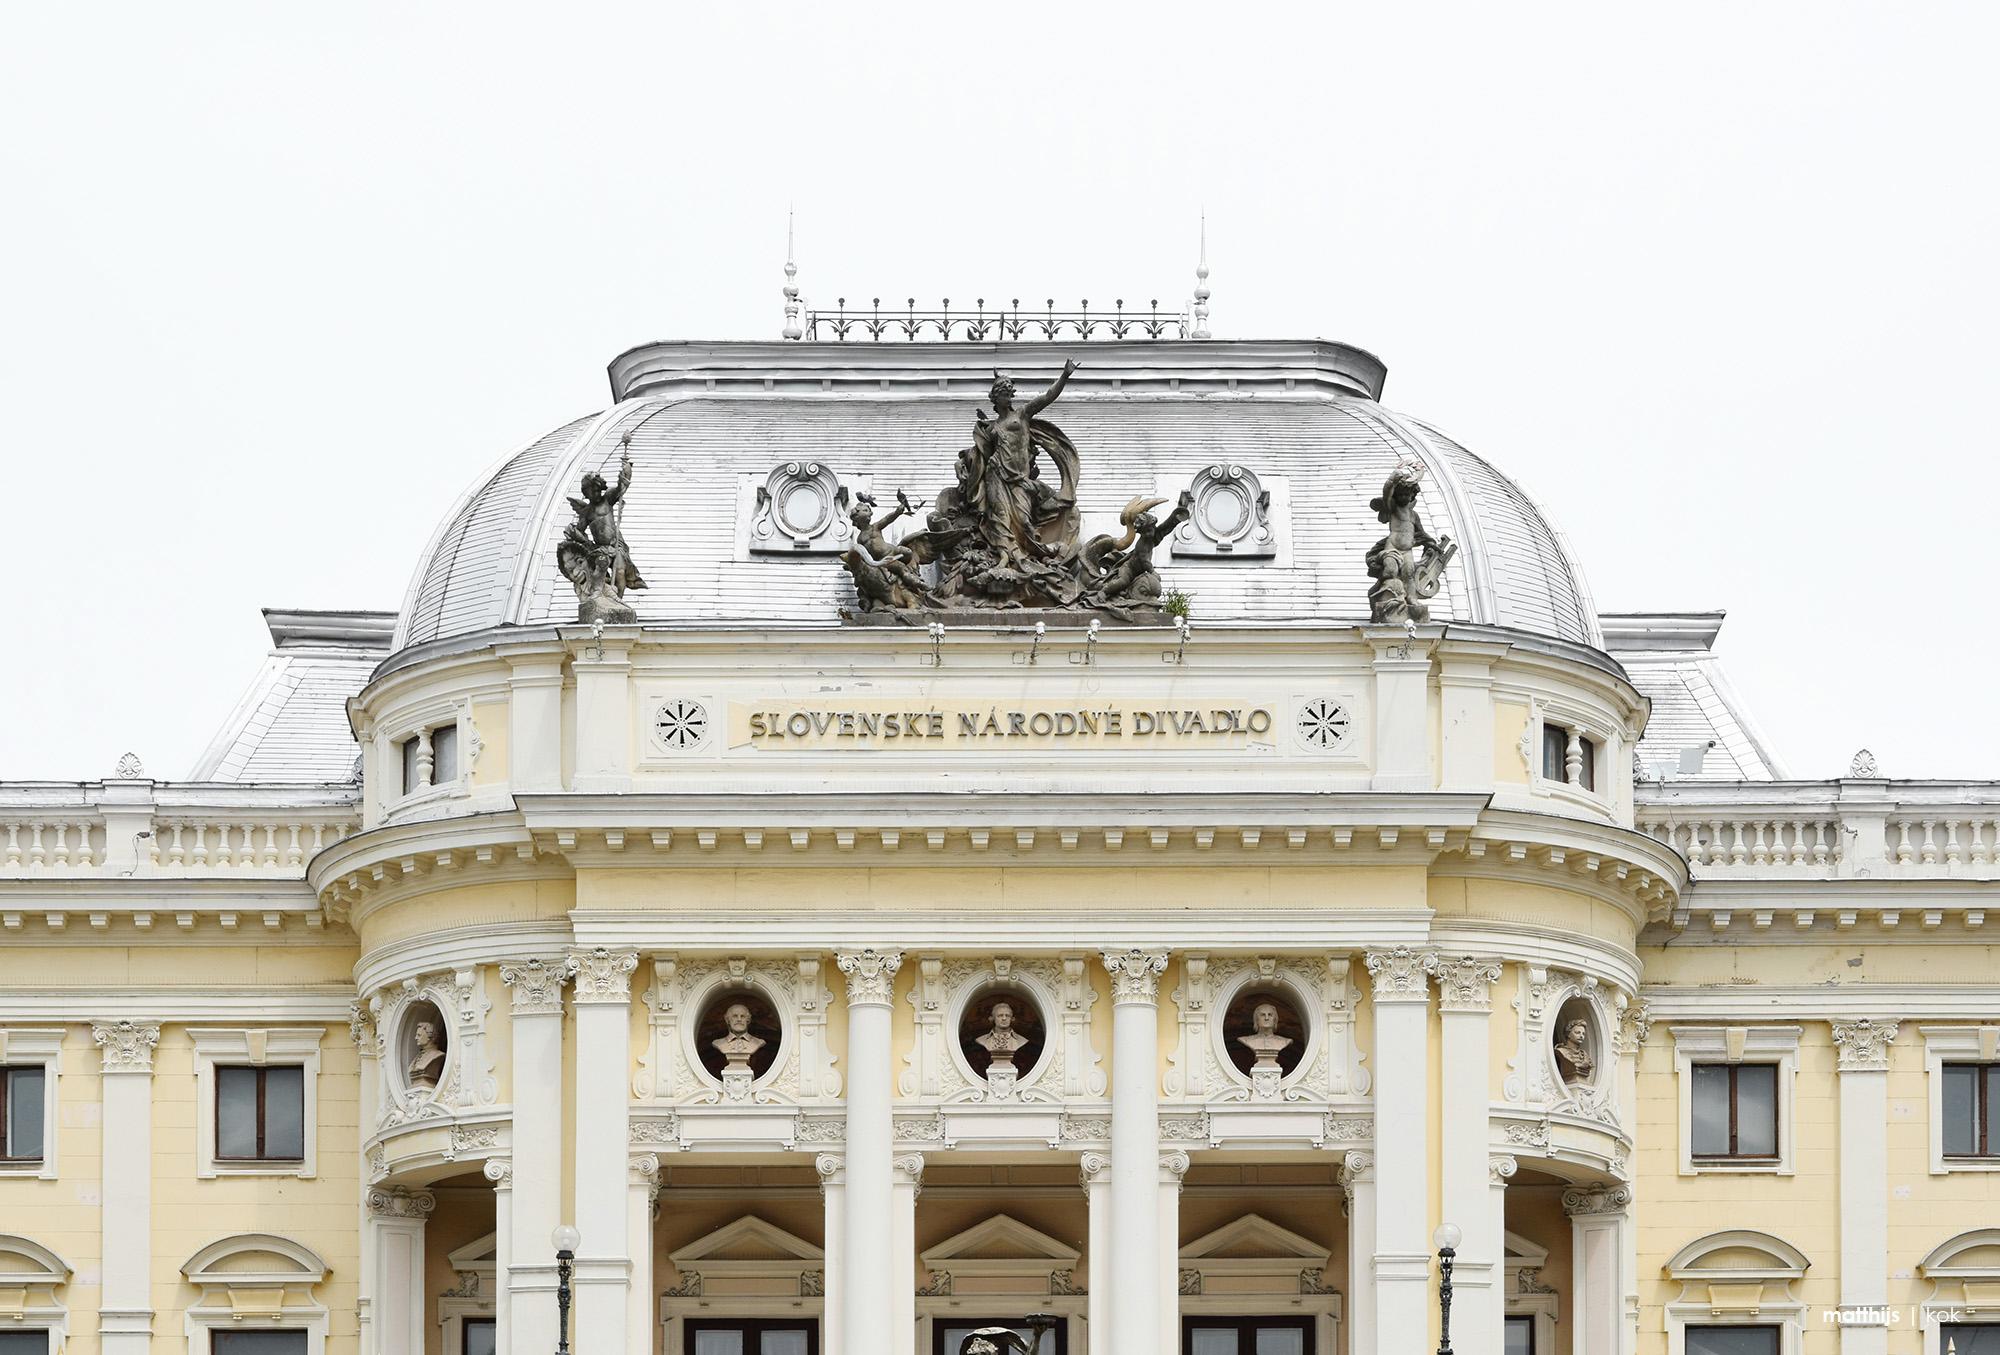 Slovak National Theatre, Bratislava, Slovakia | Photo by Matthijs Kok